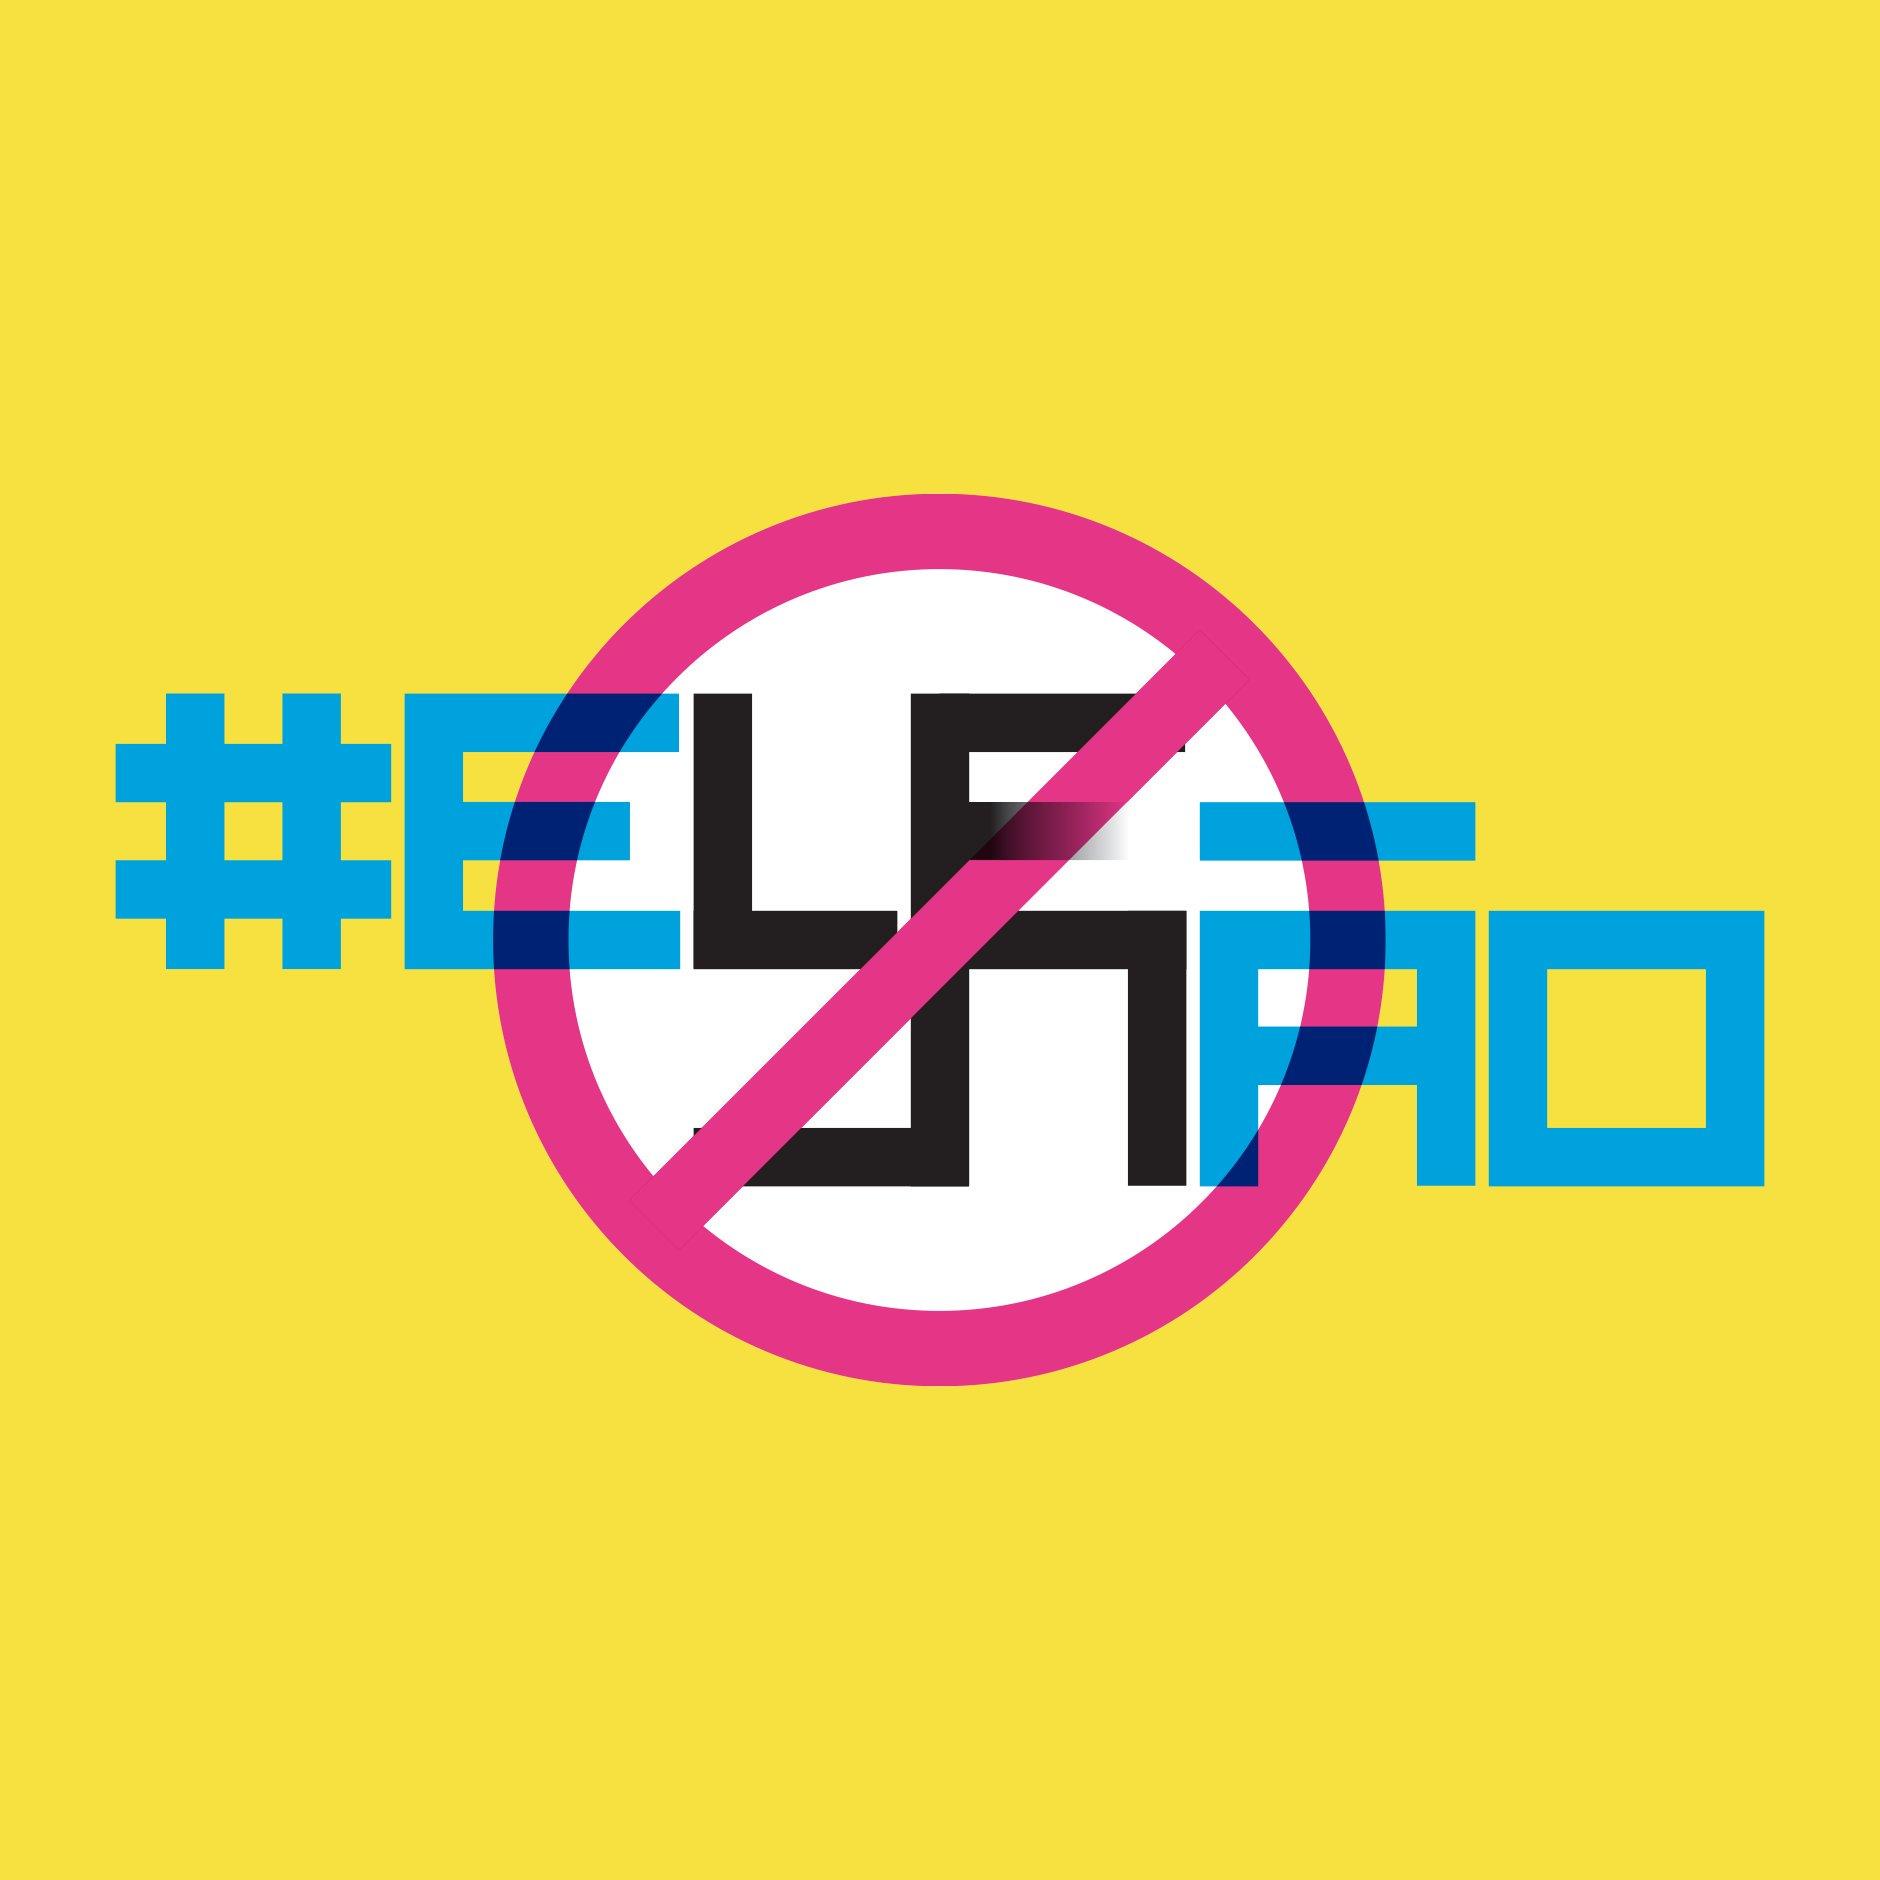 logo_levante_group_protest_frankfurt_brazilians_brasileirxs_by_andre_levy_zhion_elenao.jpeg